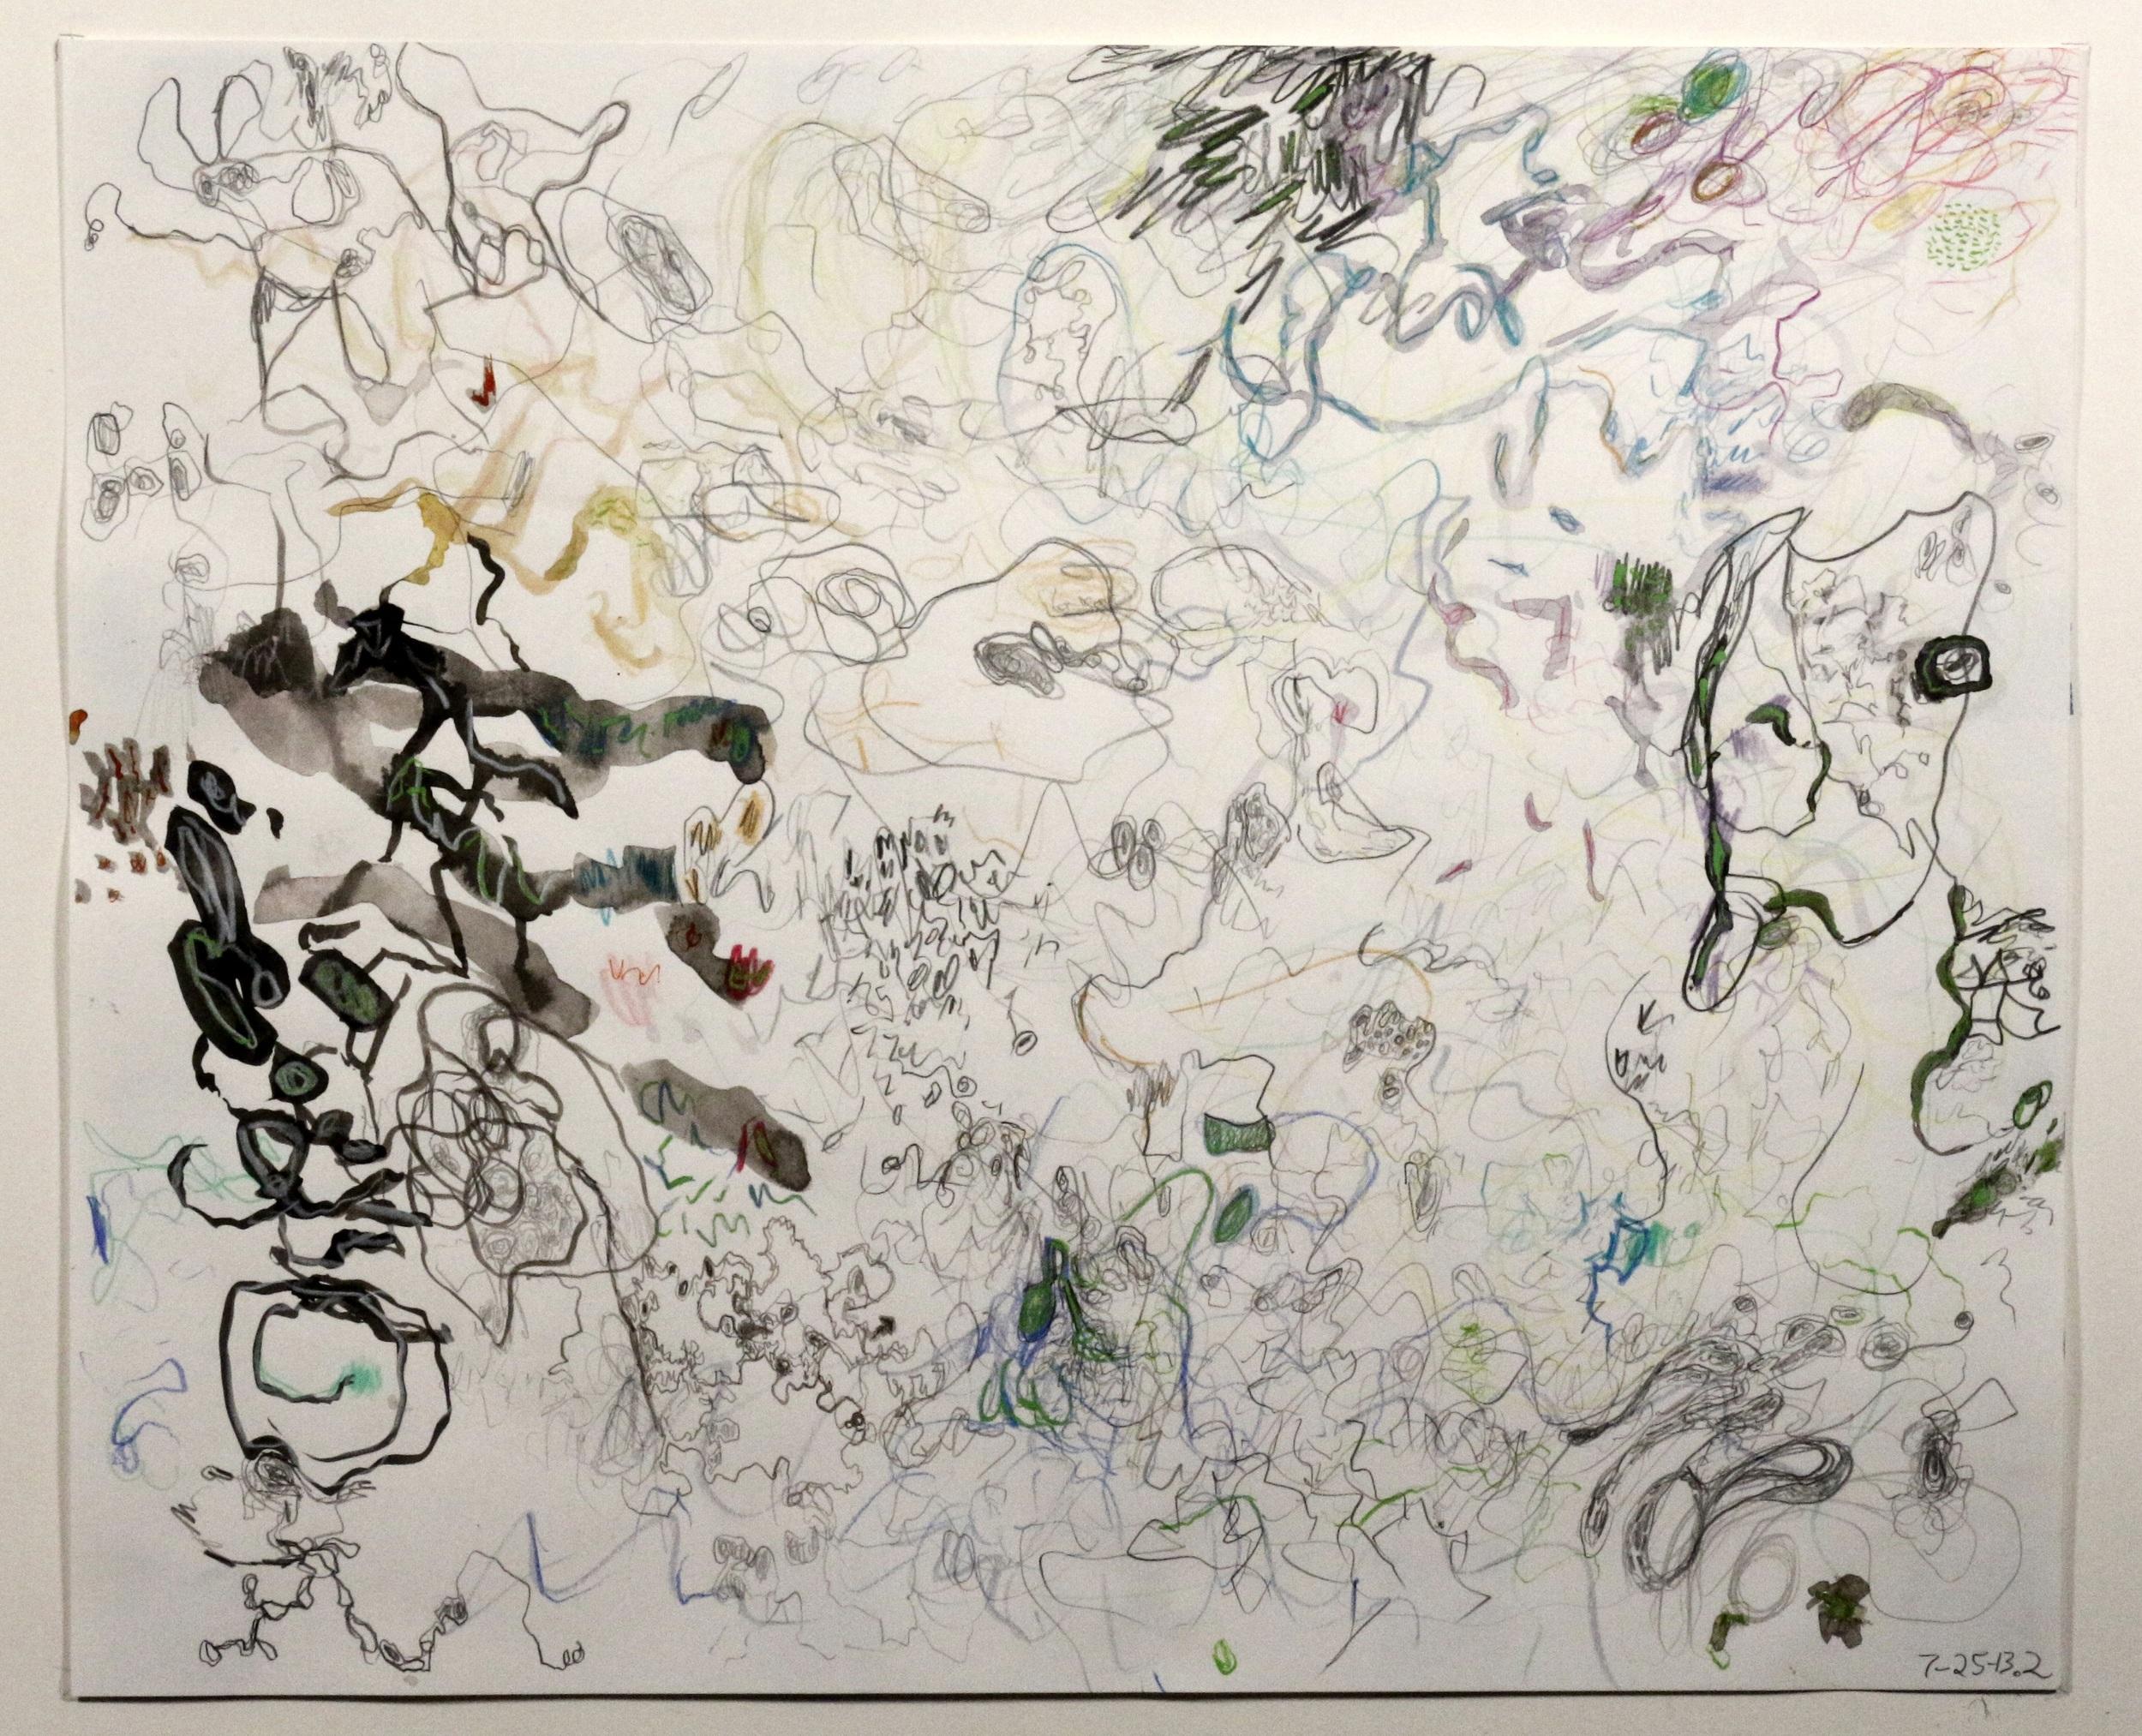 Untitled (7-25-13.2)